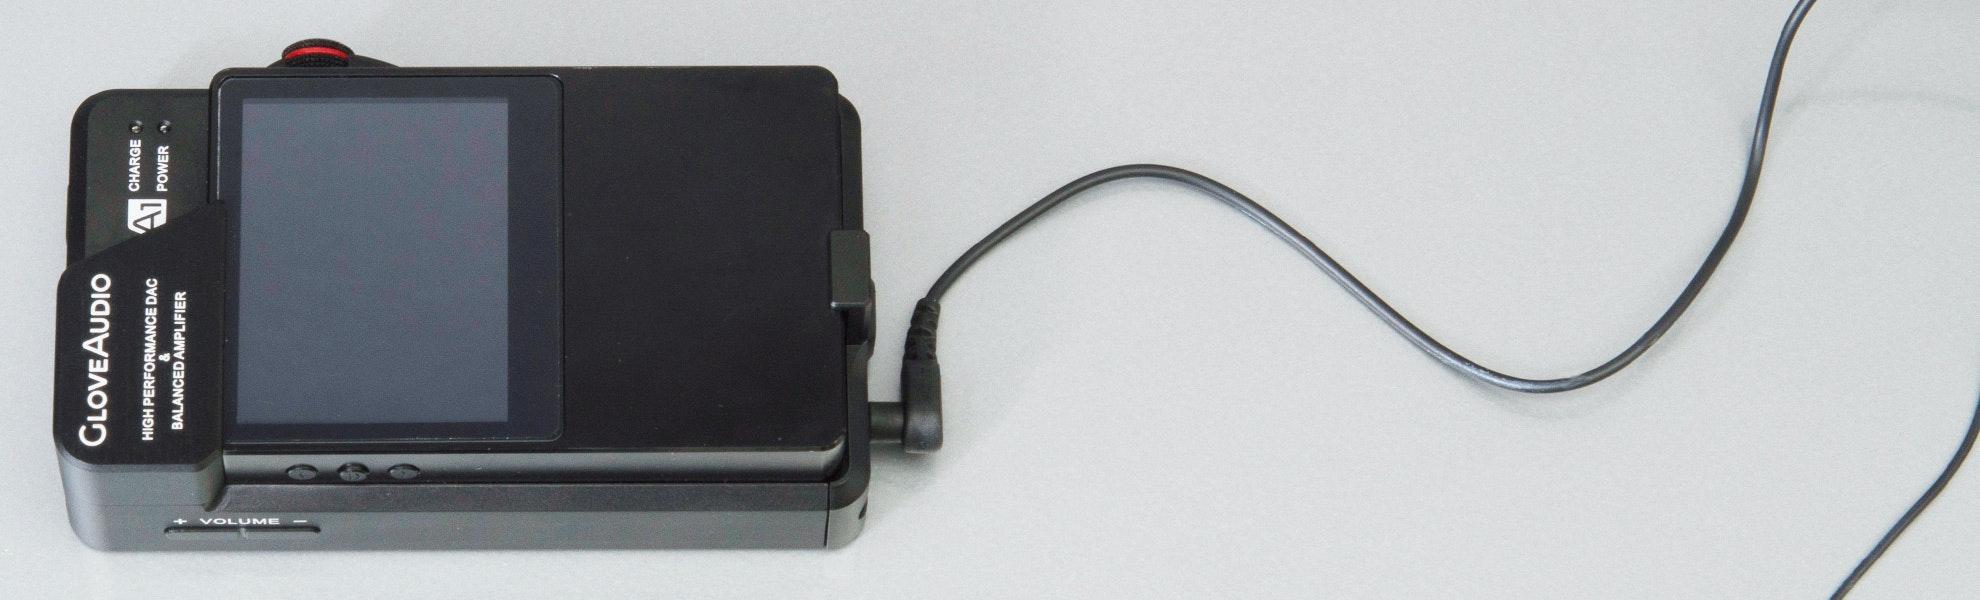 CEntrance GloveAudio A1 Amplifier